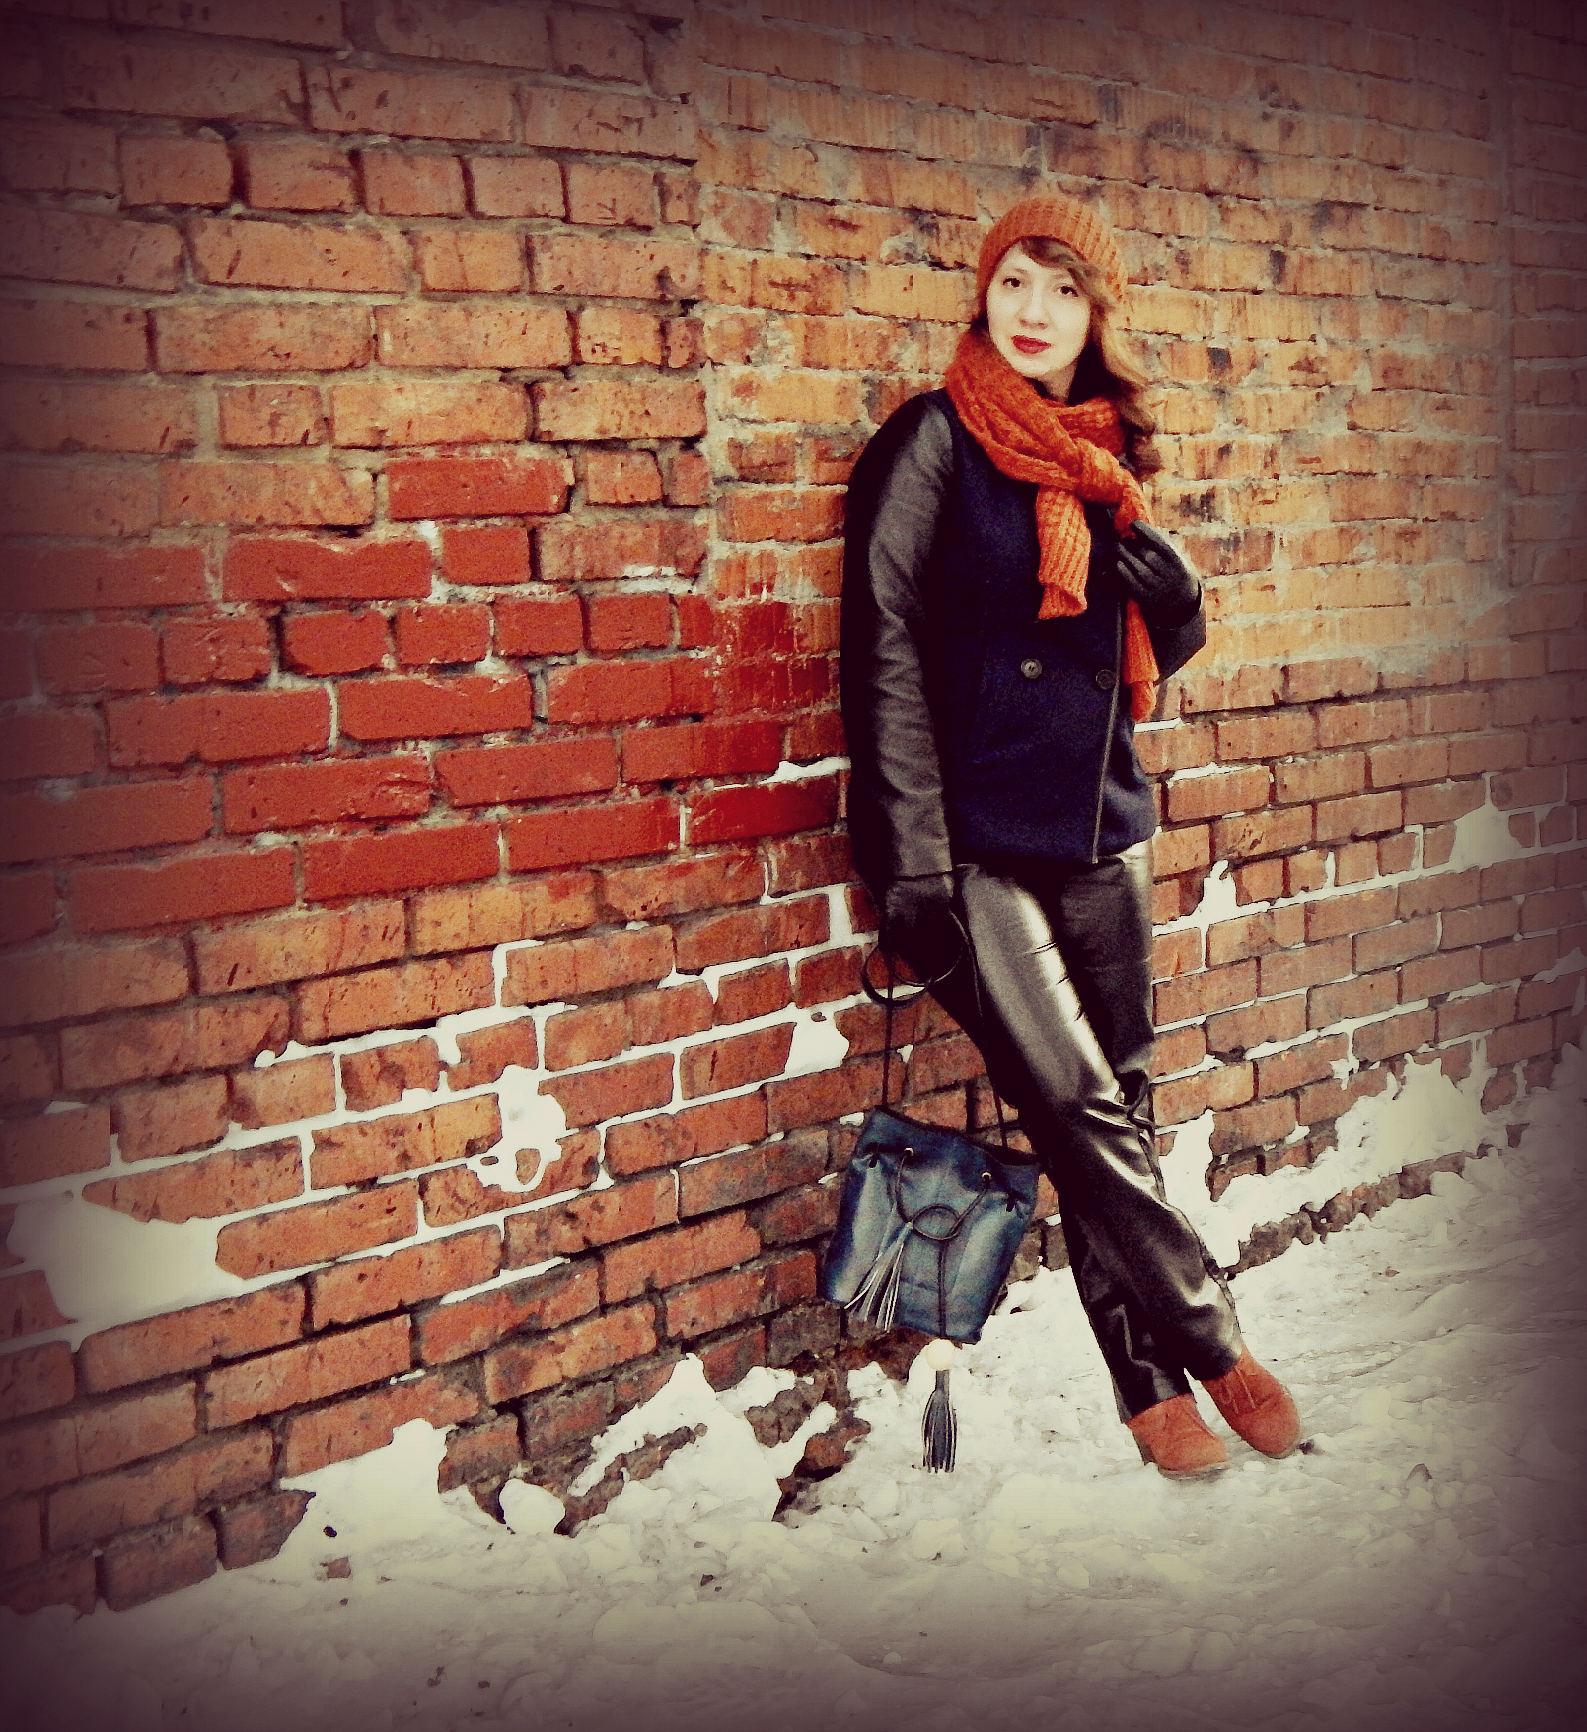 Leather passions...http://elena5mamaeva.tumblr.com/